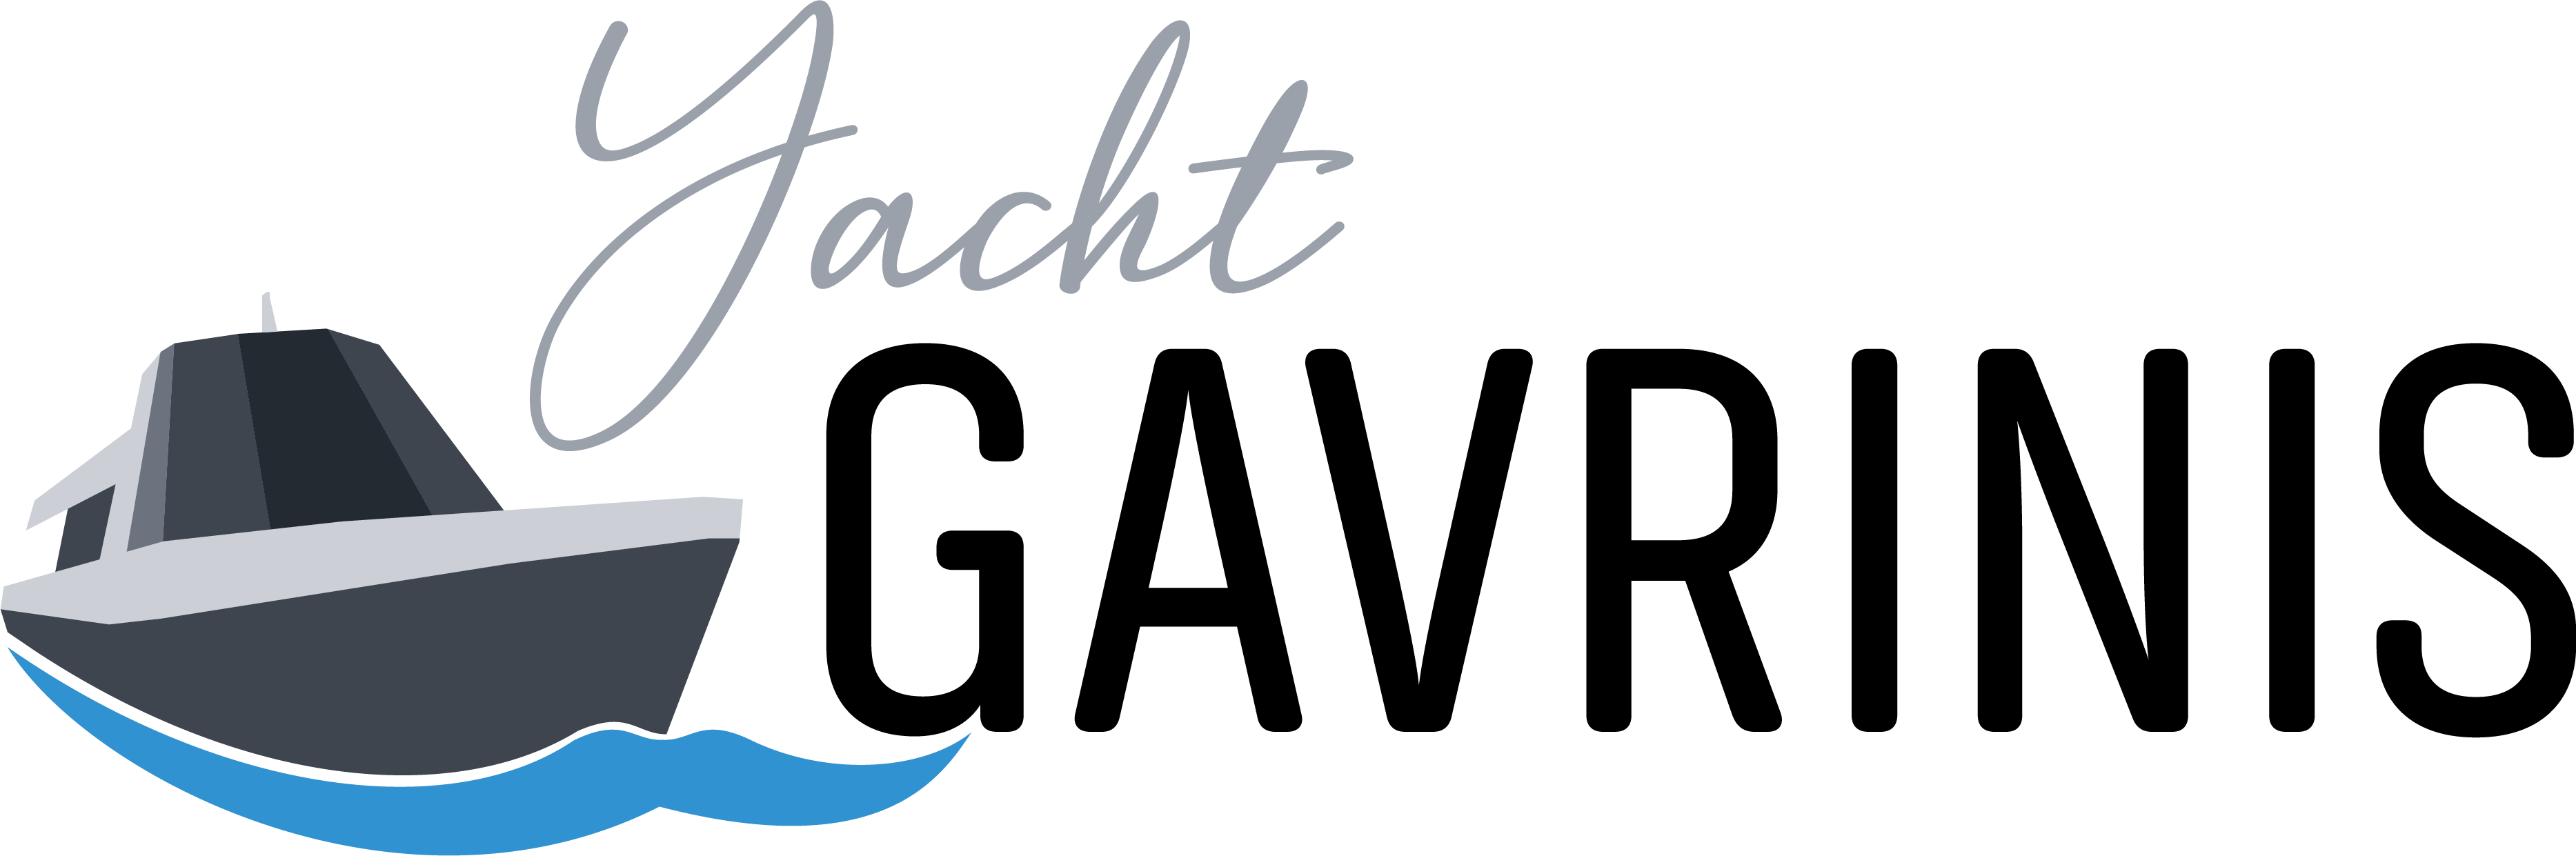 logo Yacht Gavrinis